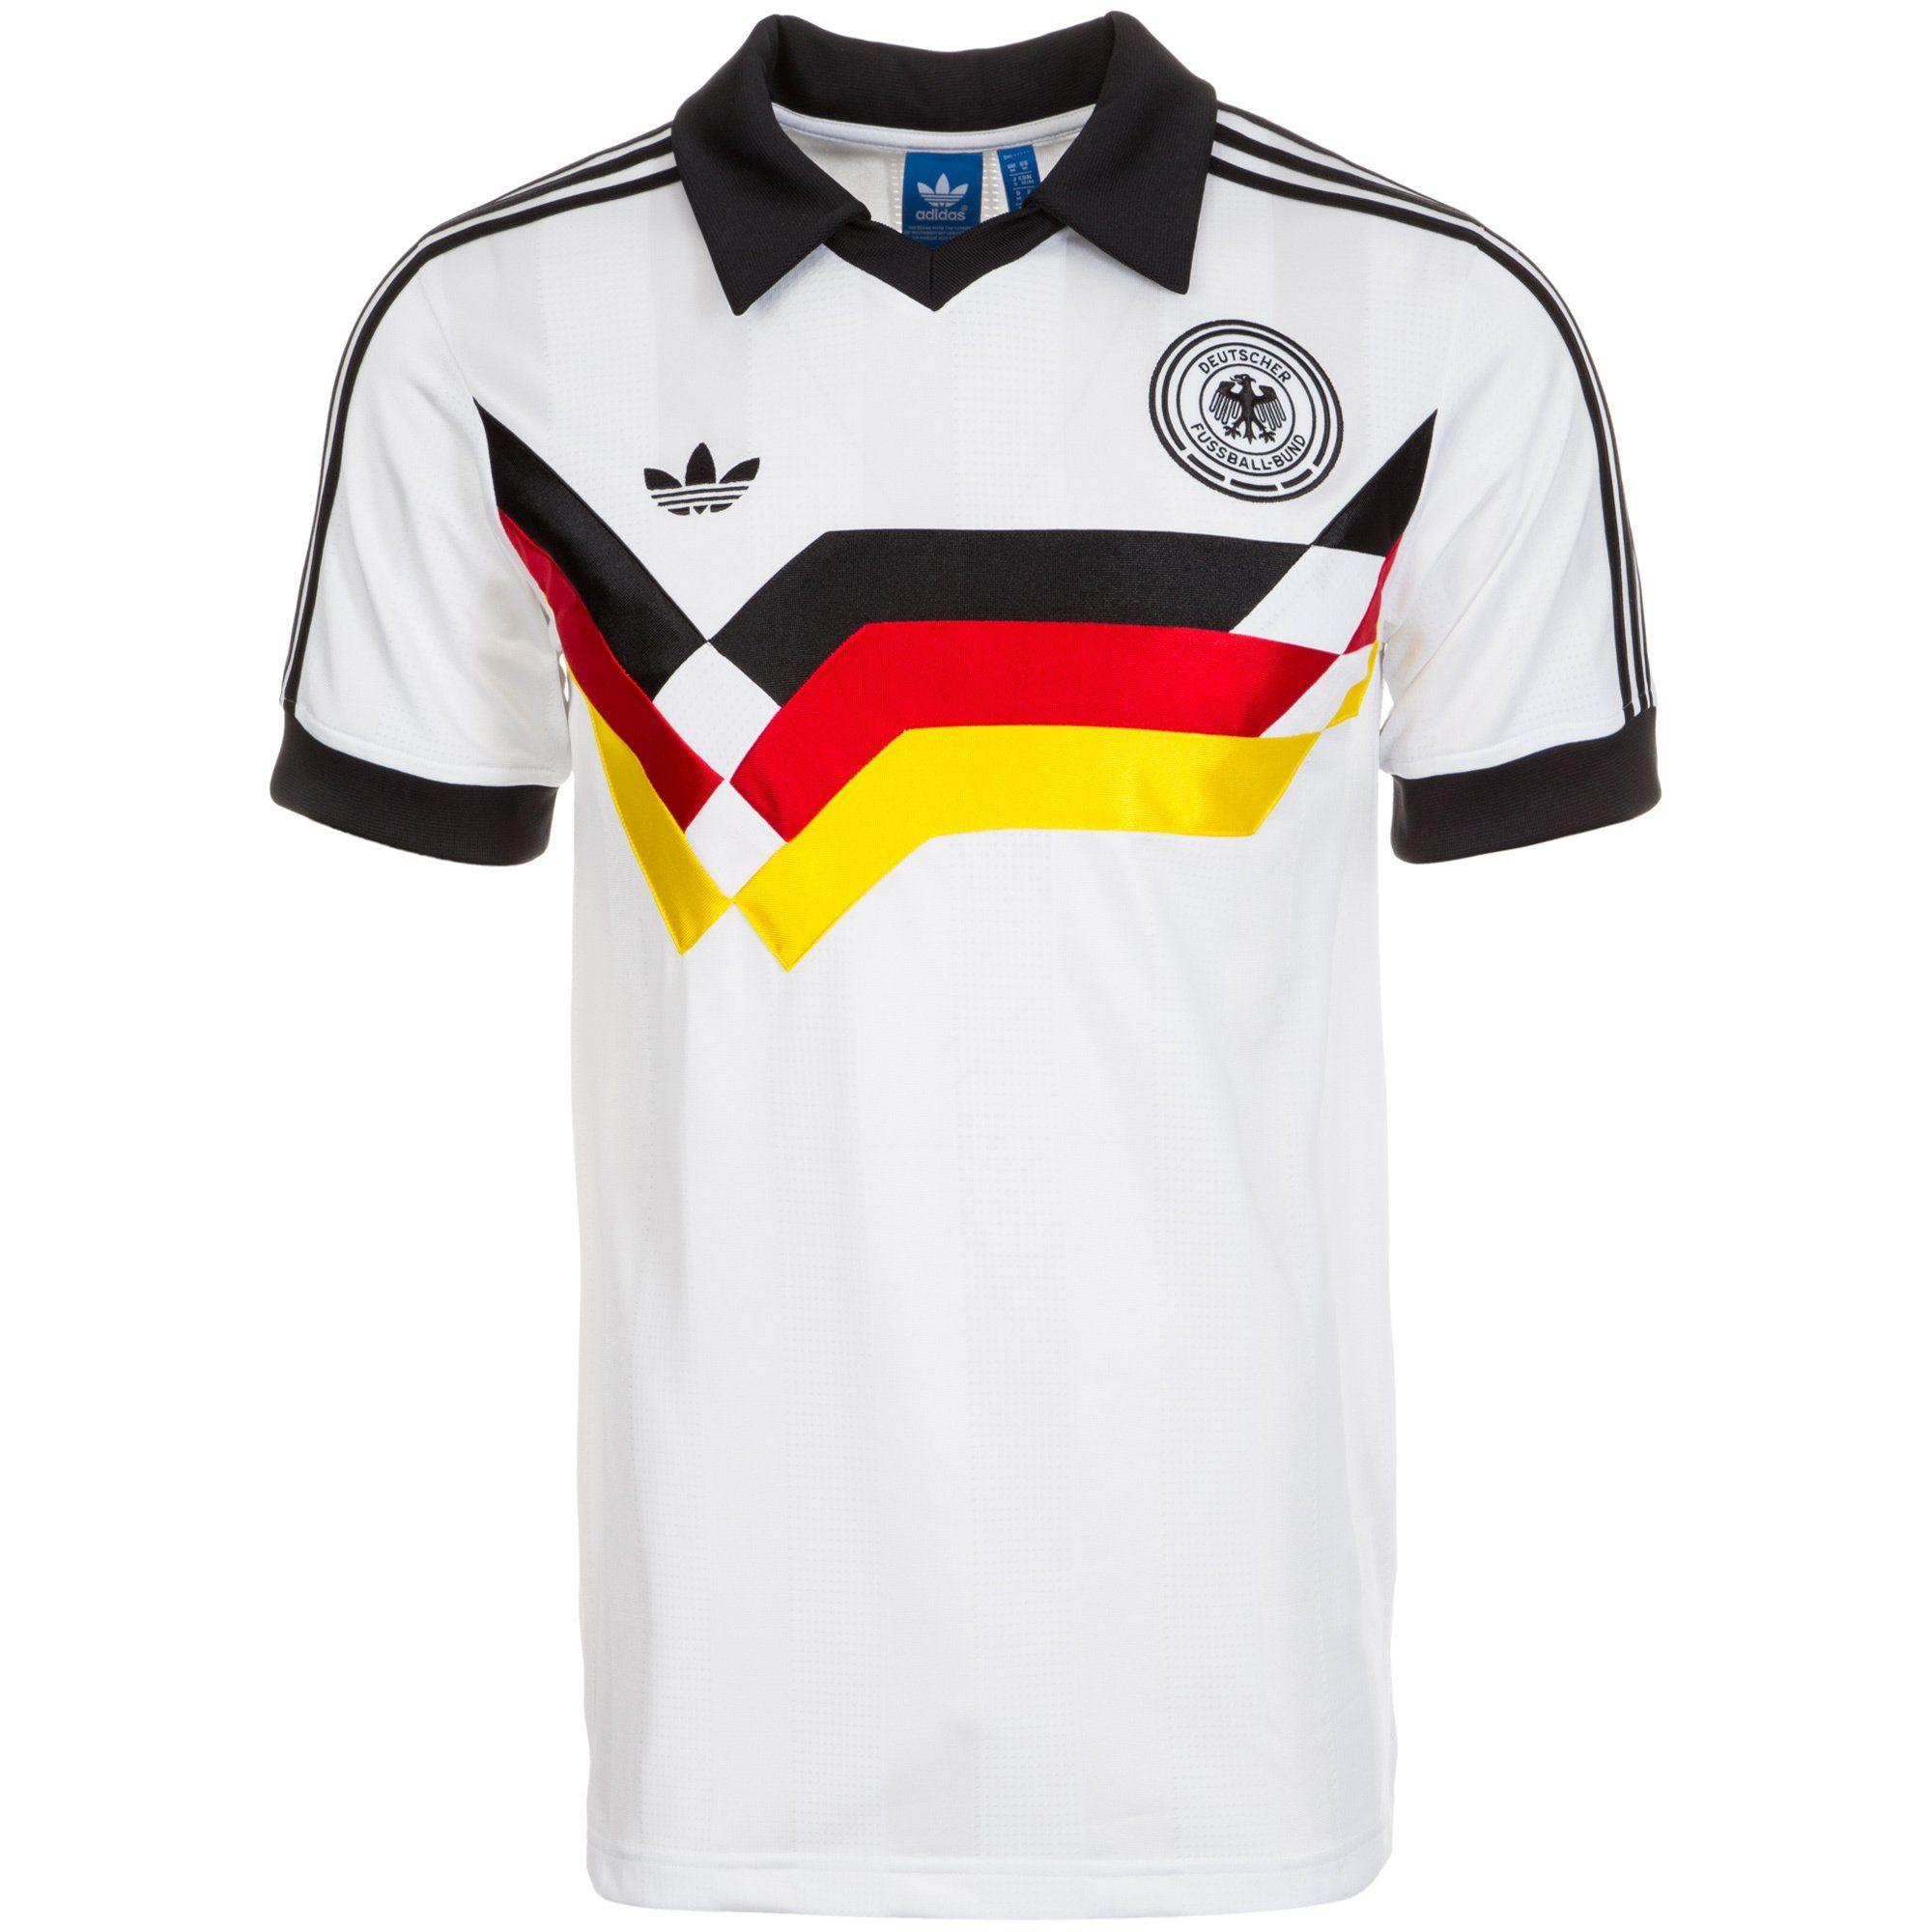 rendimiento superior calidad elige el más nuevo Adidas originals Germany jersey DfB T-Shirt 1990 white men's  XS/S/M/L/XL/XXL shirt buy & order online Shop - spieler-trikot.de retro,  vintage & old football shirts & jersey from super stars